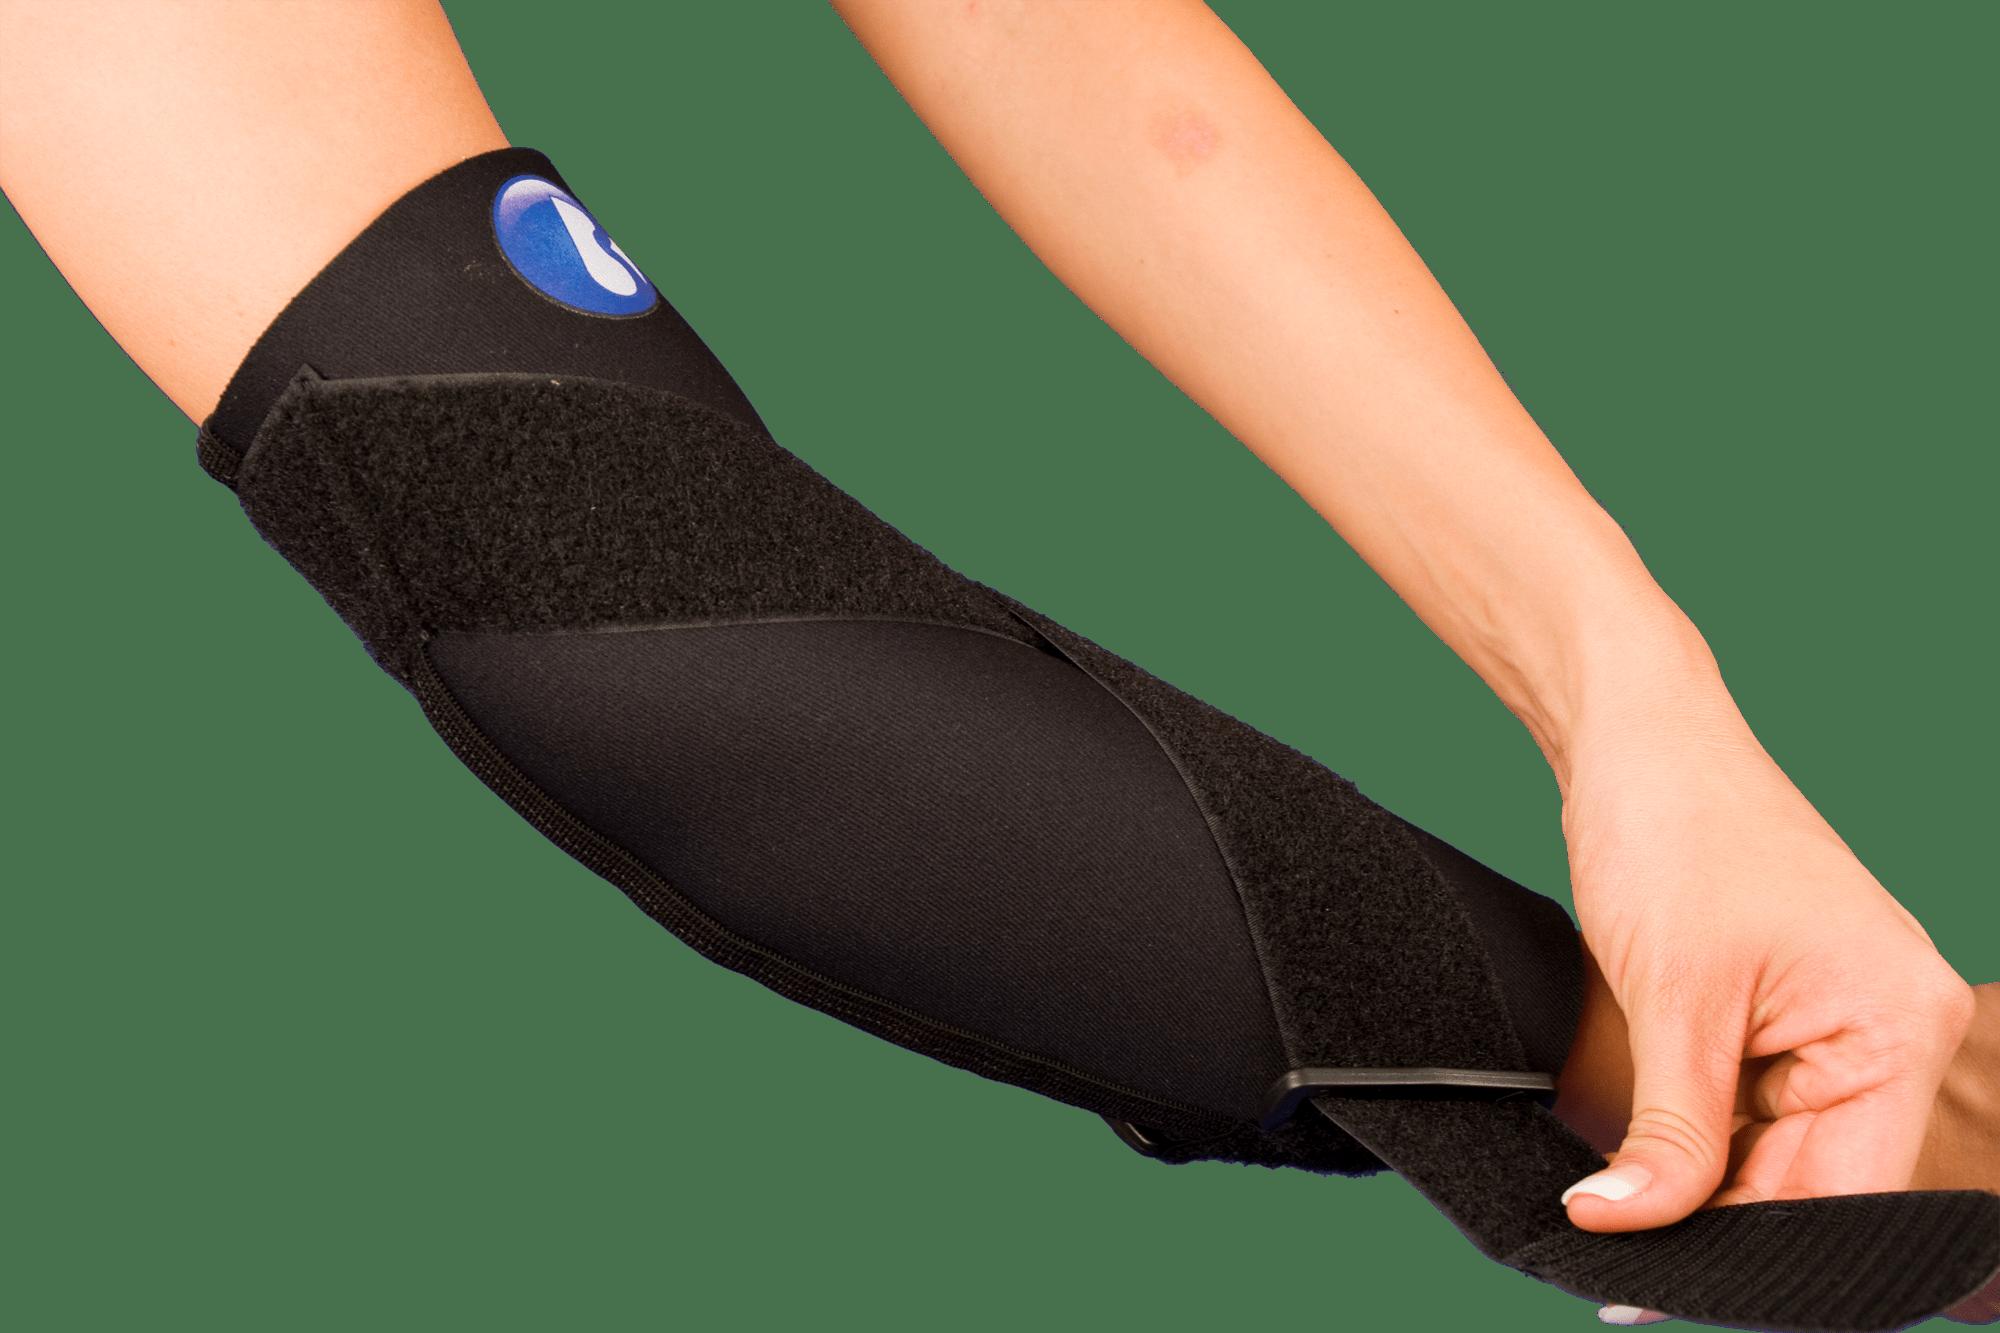 Bunga Braces - Hyperextension Elbow Support